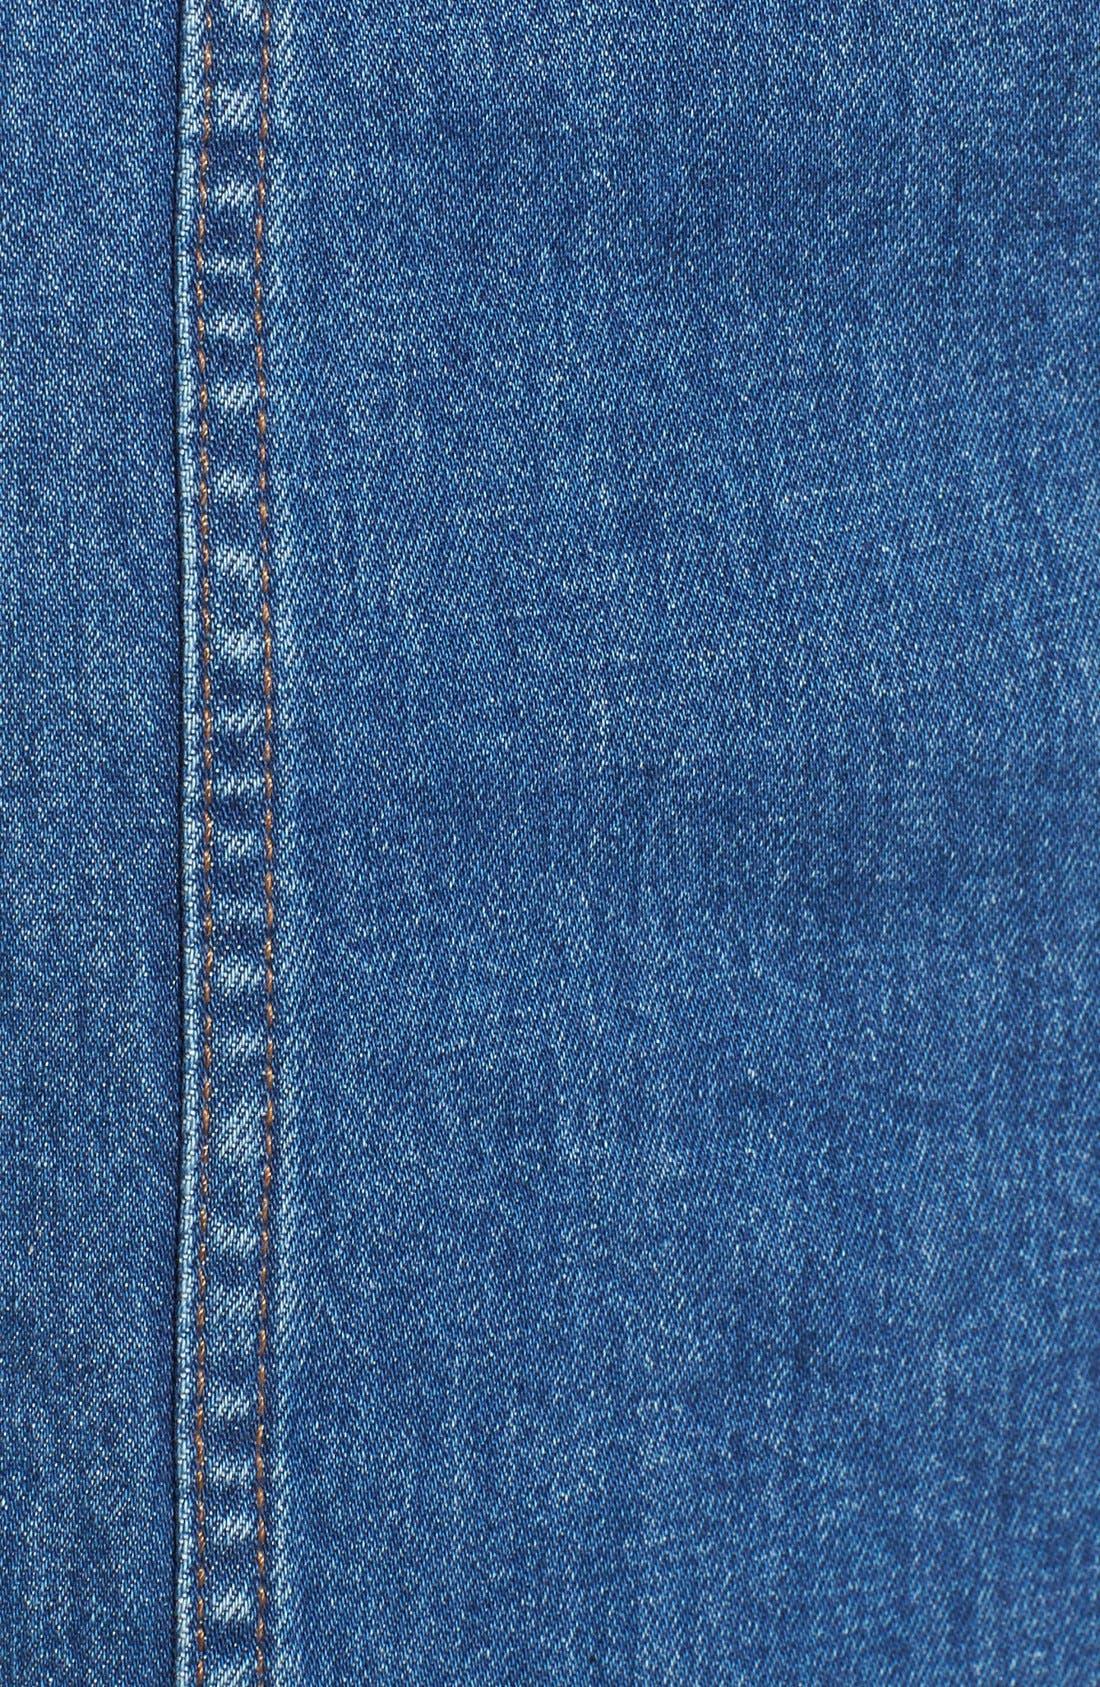 'Dungaree' Denim Midi Dress,                             Alternate thumbnail 3, color,                             400